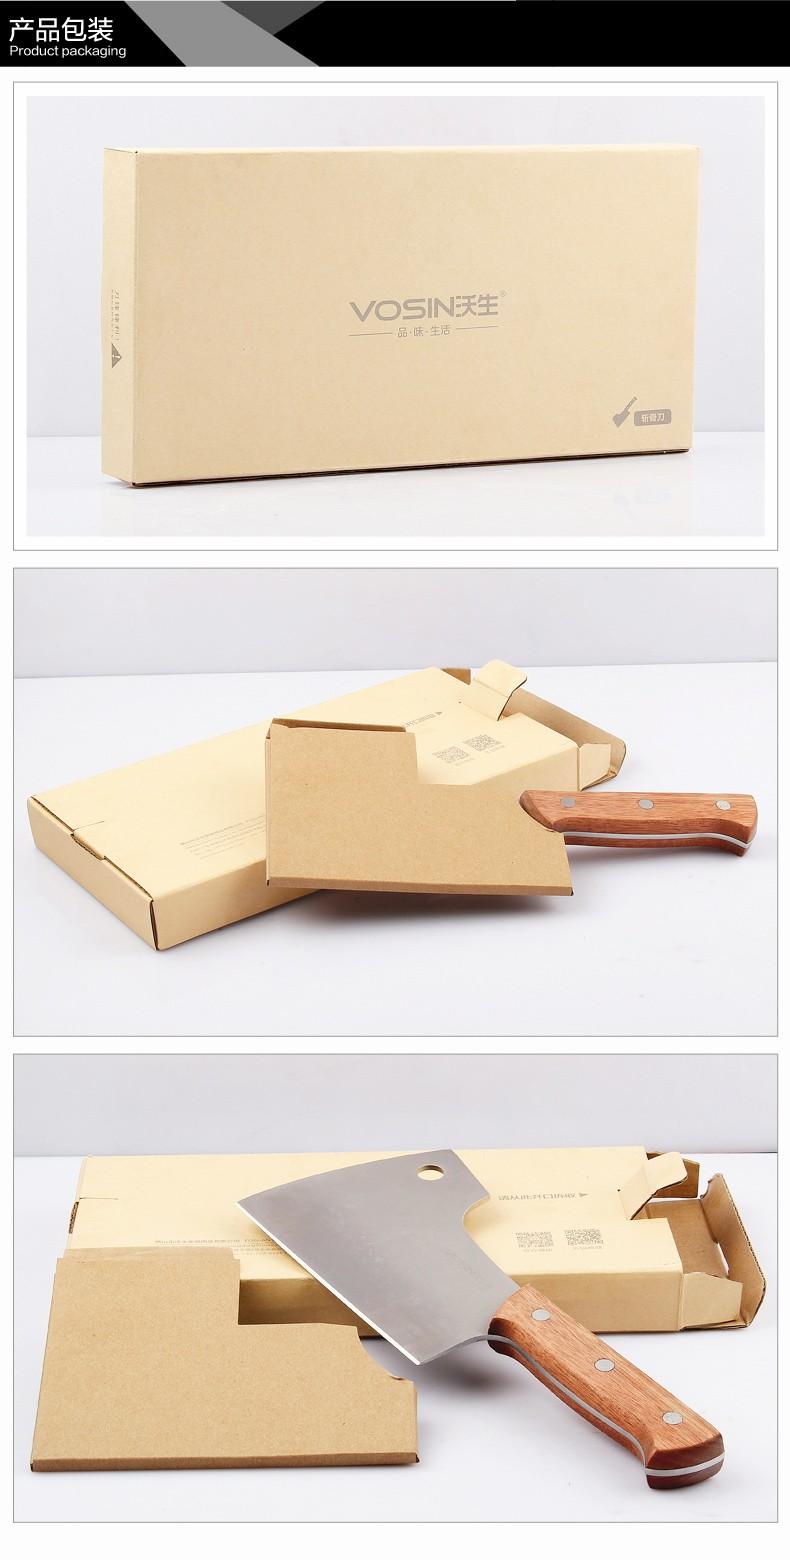 Buy Manual German Kitchenware steel kitchen knives intermaxillary cut / cut bone knife + traditional forging process cheap